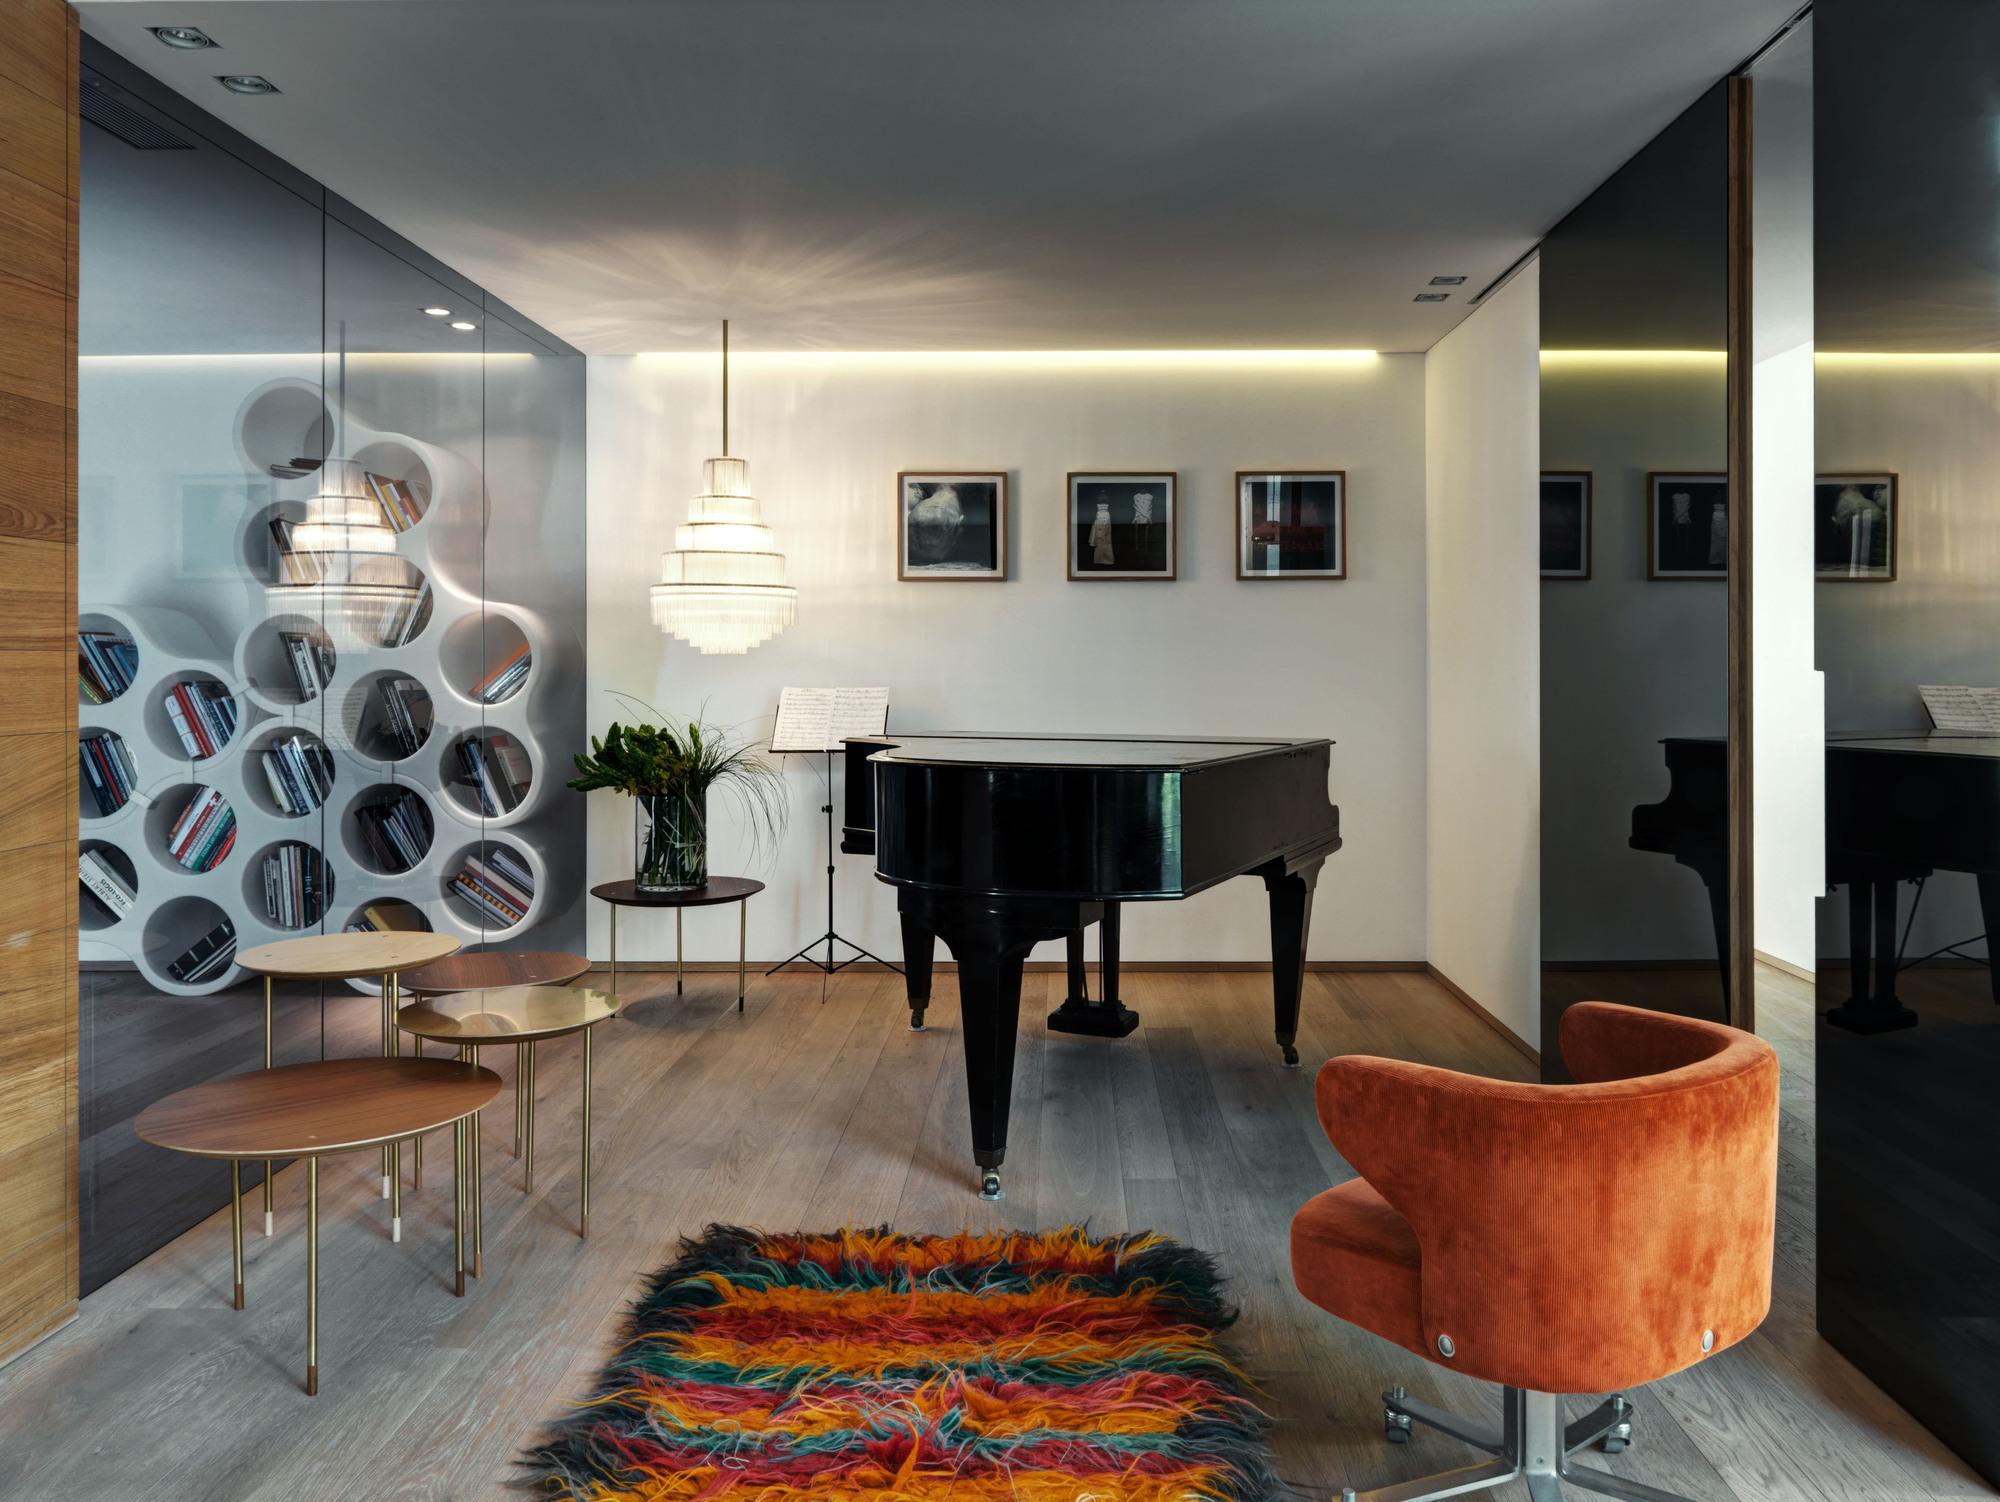 Fachada arquitectura ideal - Fachada de cristal ...